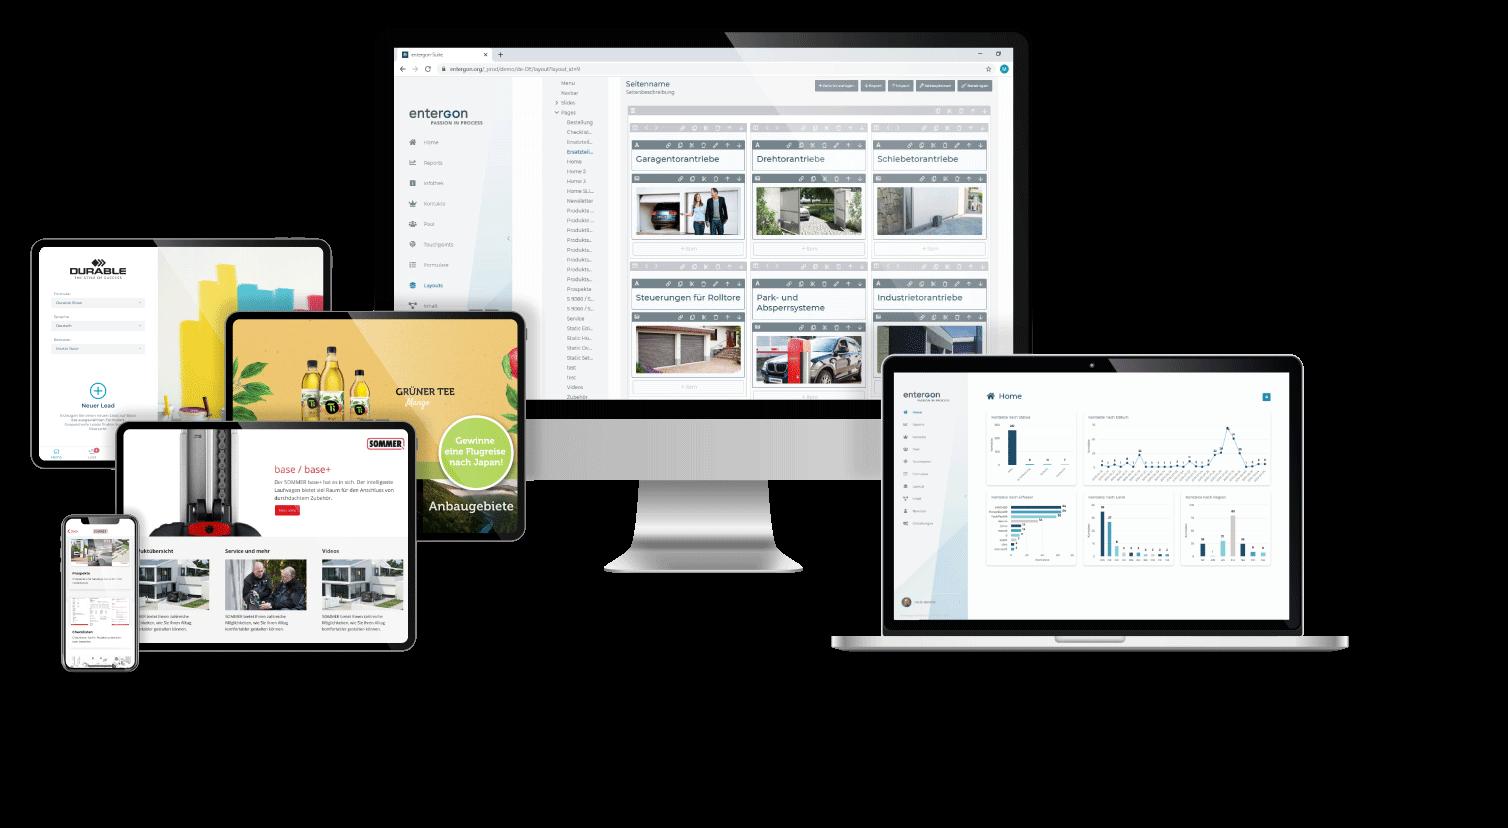 Multimedialer Content auf Tablets, Displays und Touchscreens